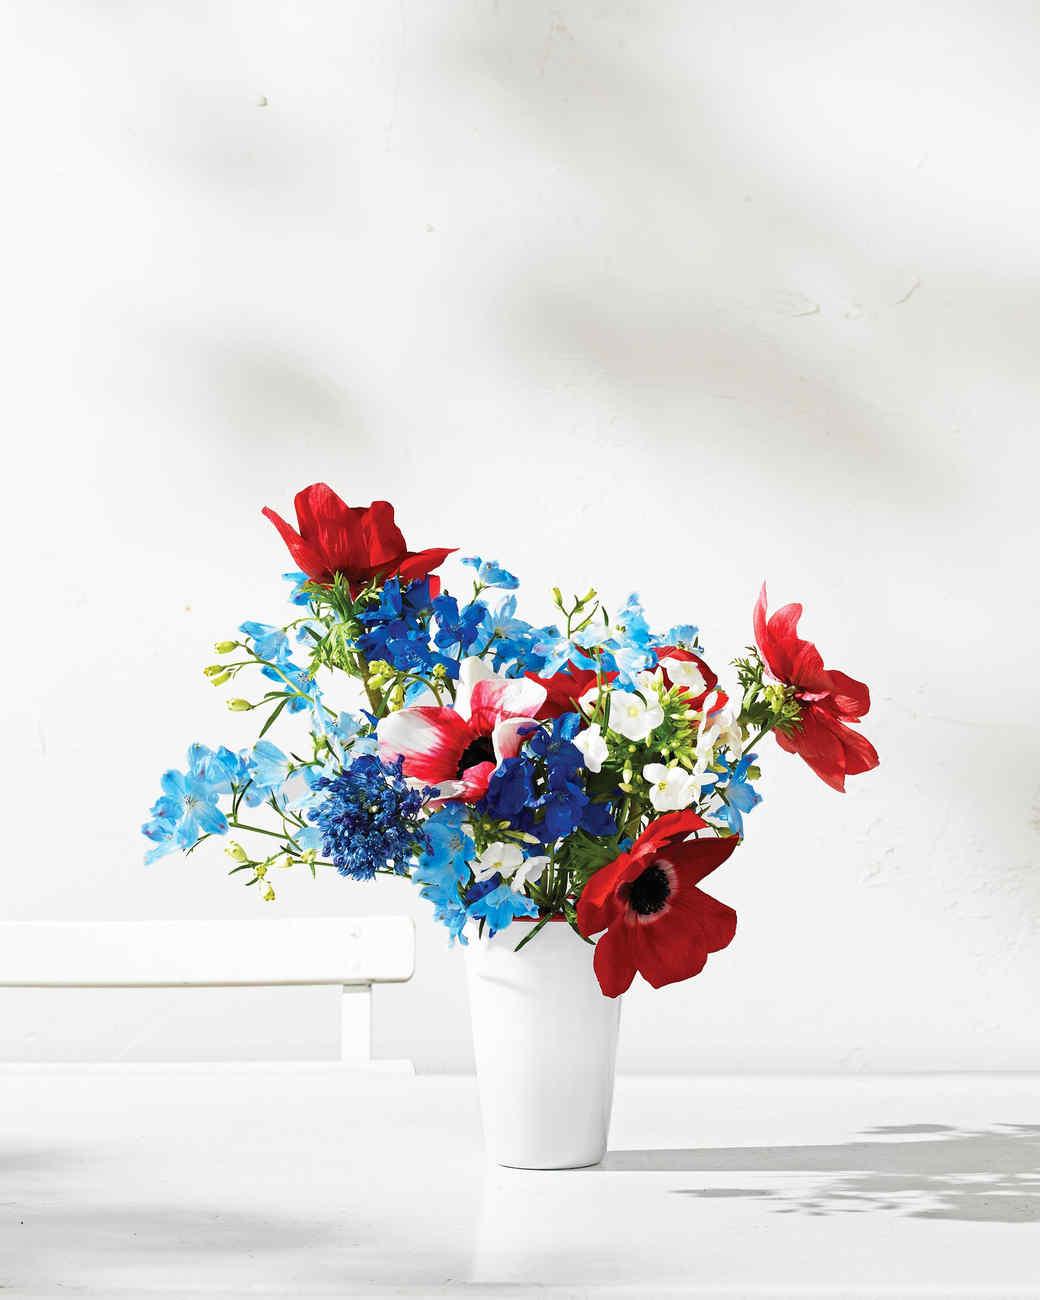 red-white-blue-arrangement-212-d112984.jpg